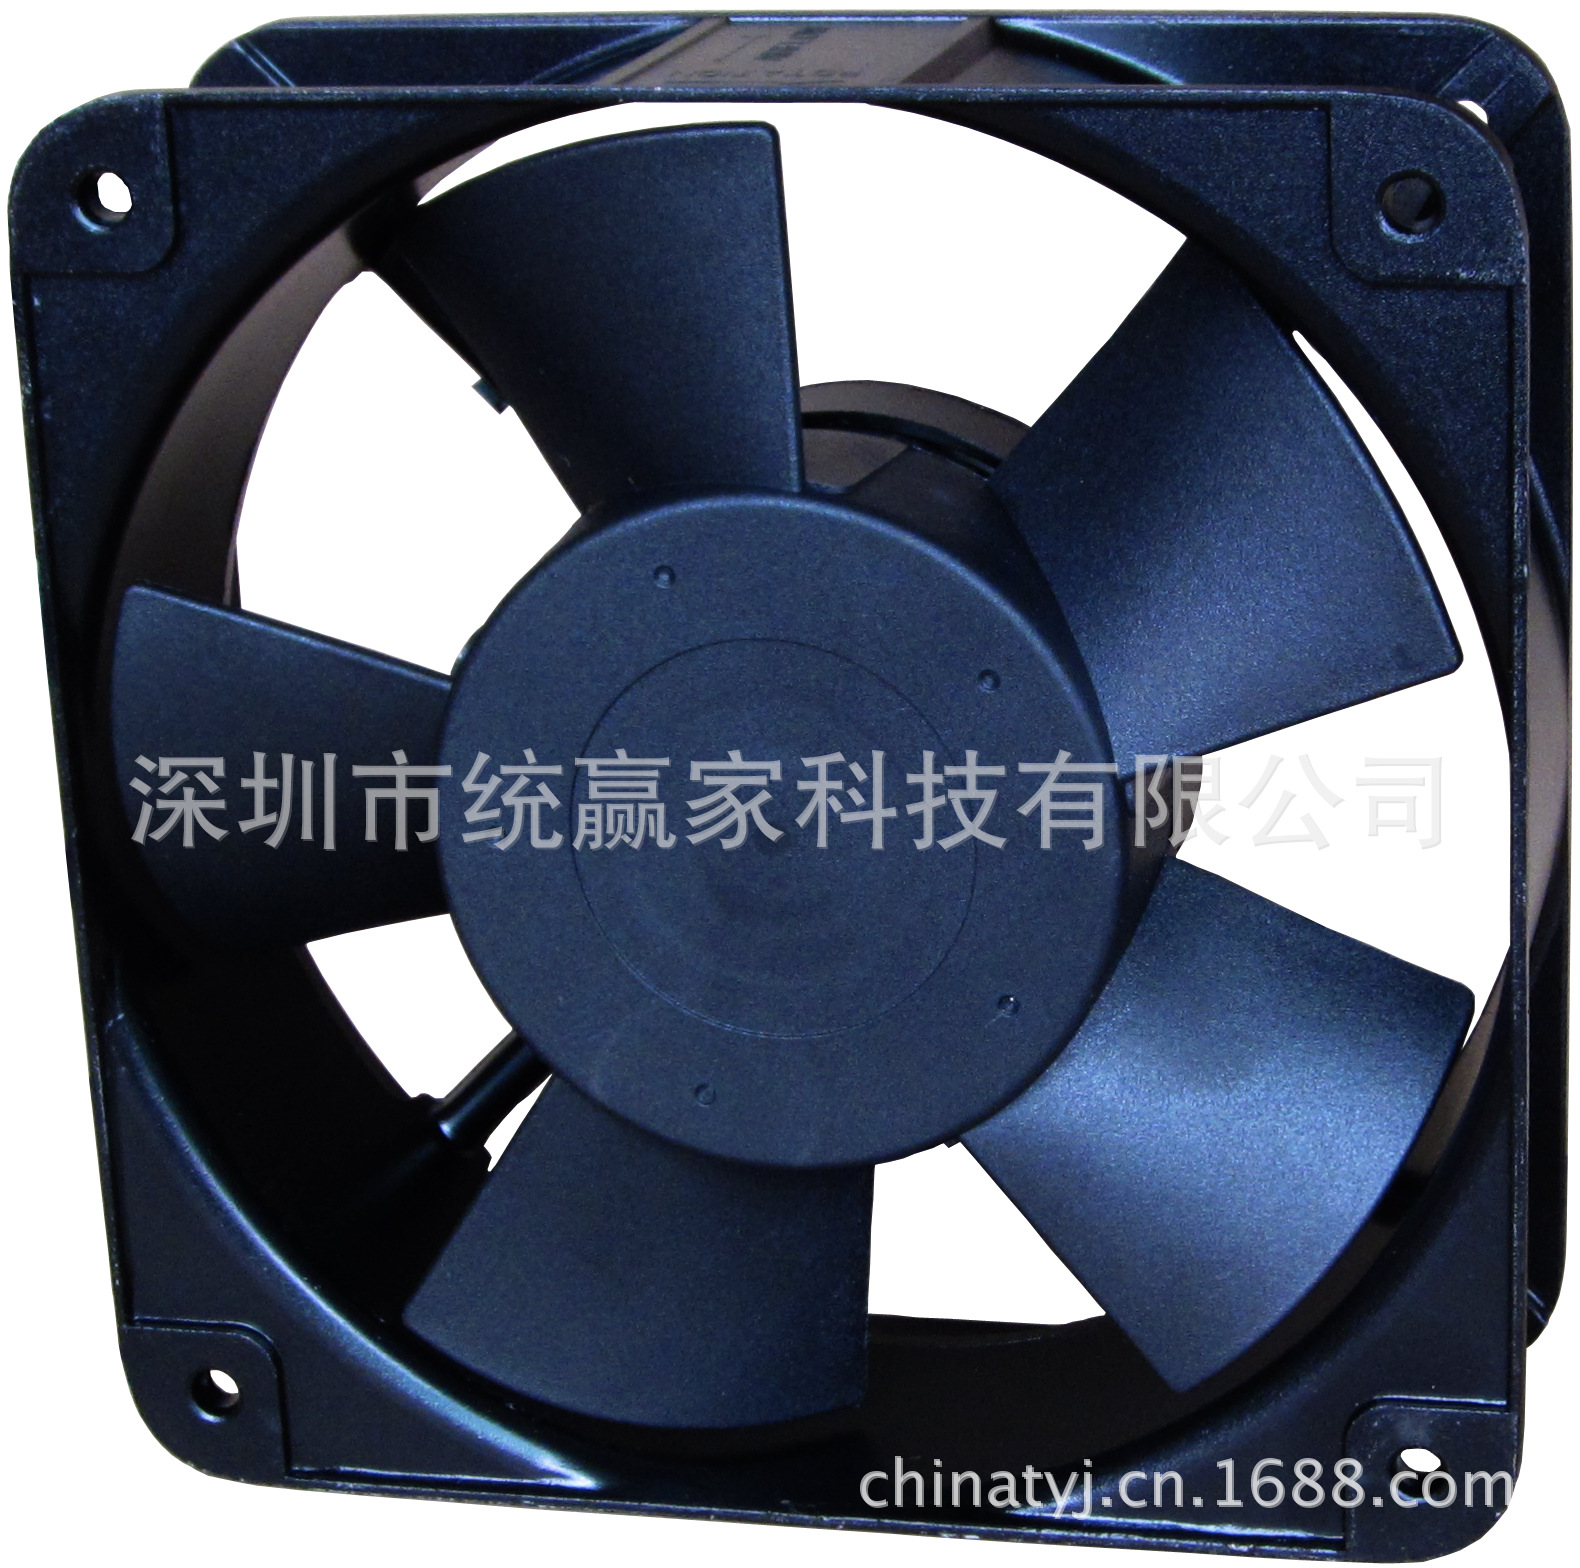 TYJ品牌轴流散热风扇风机18060HBL双滚珠CE/UL交流A YA218060HBL